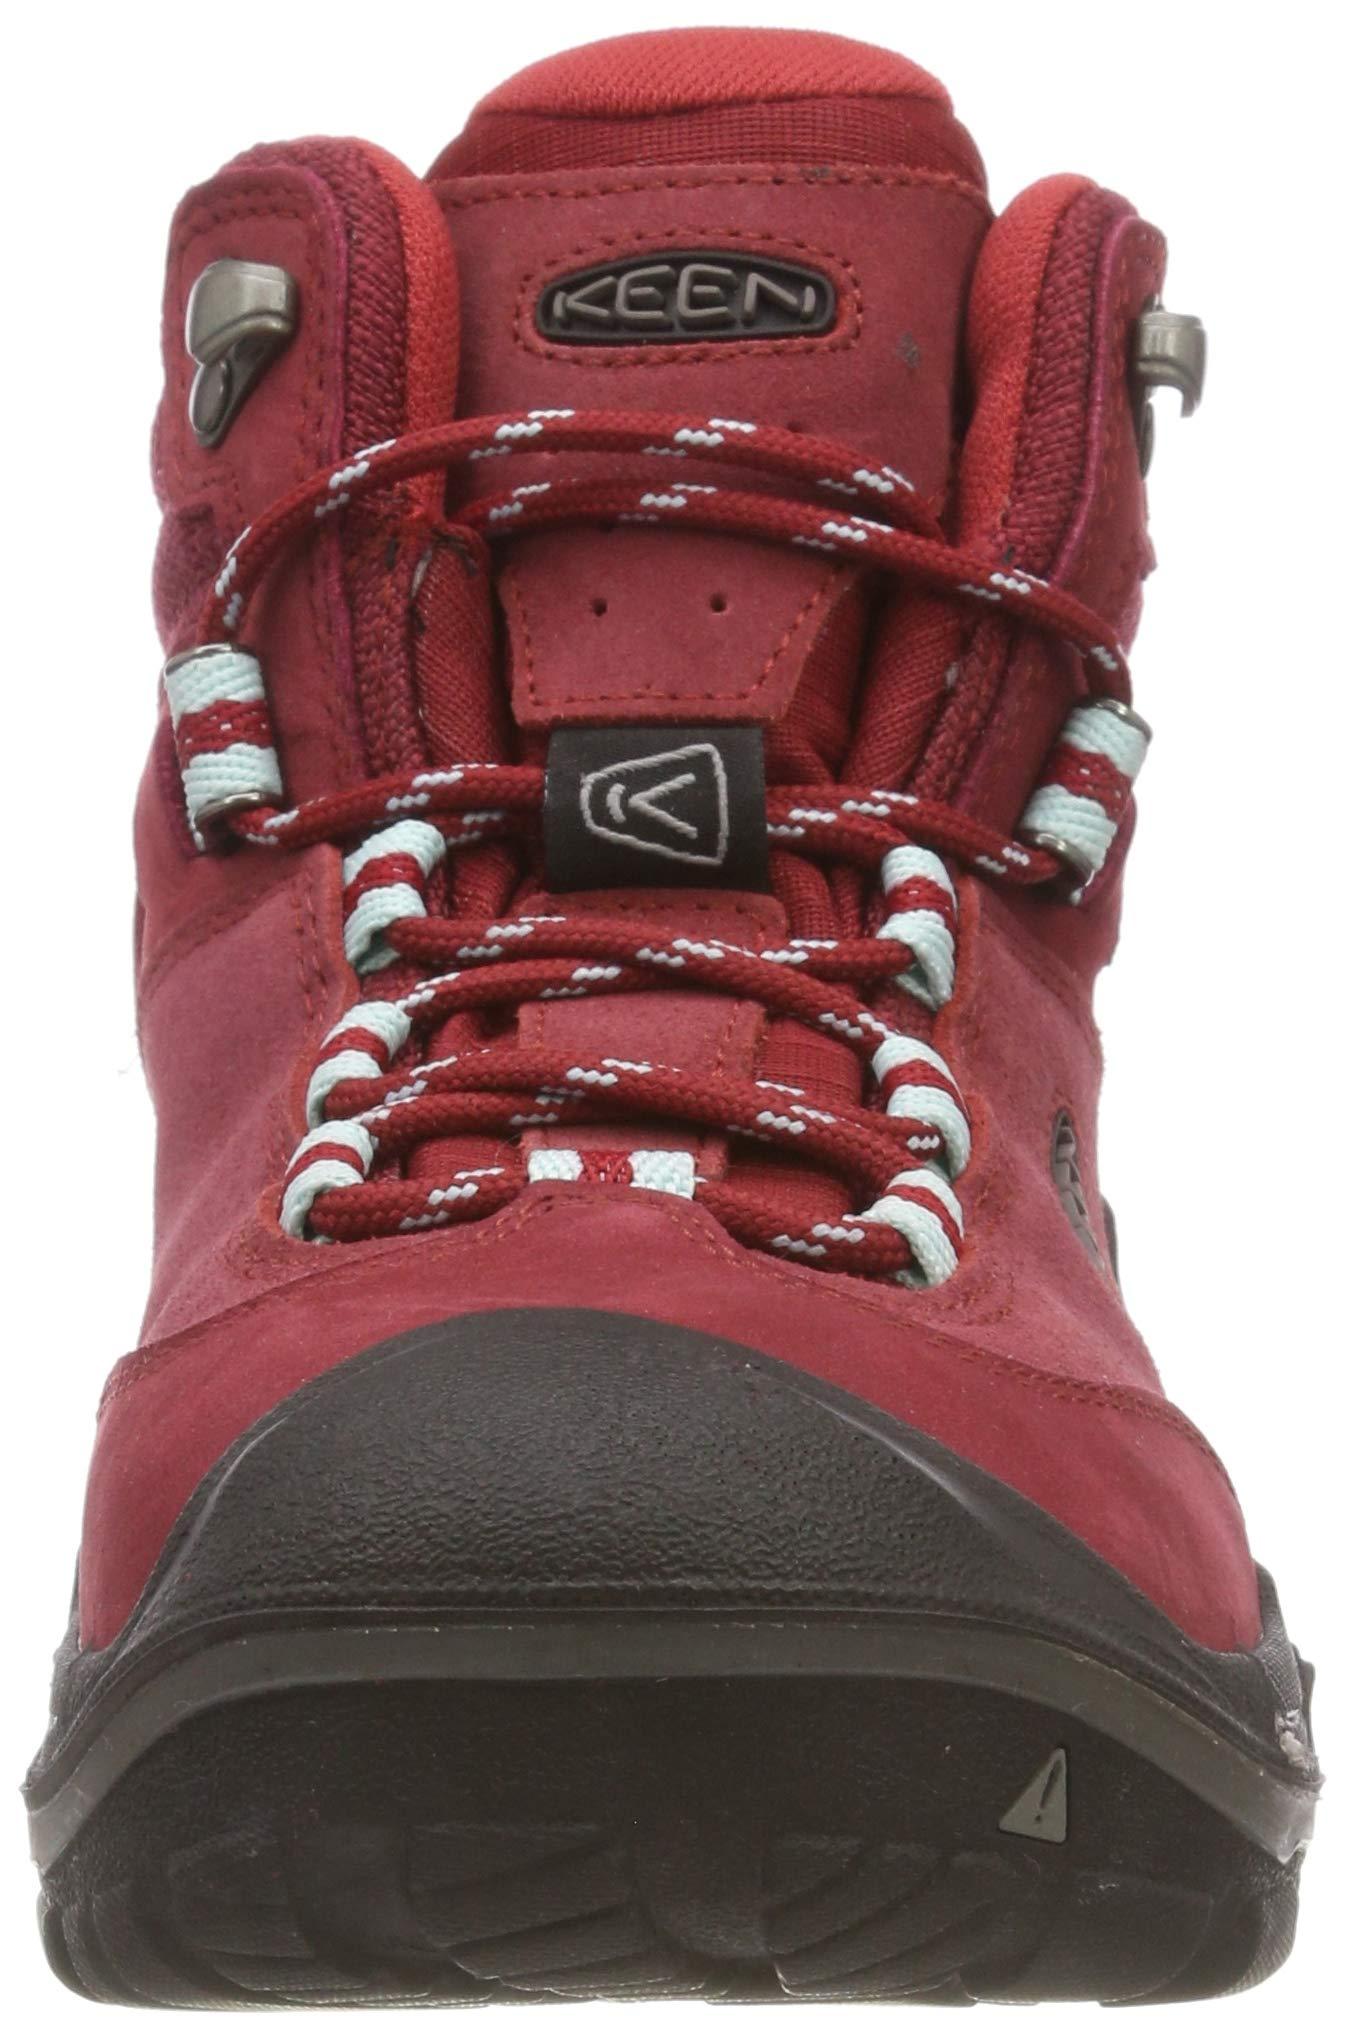 KEEN Women's Wanderer Waterproof Mid High Rise Hiking Shoes, 8.5 UK 4